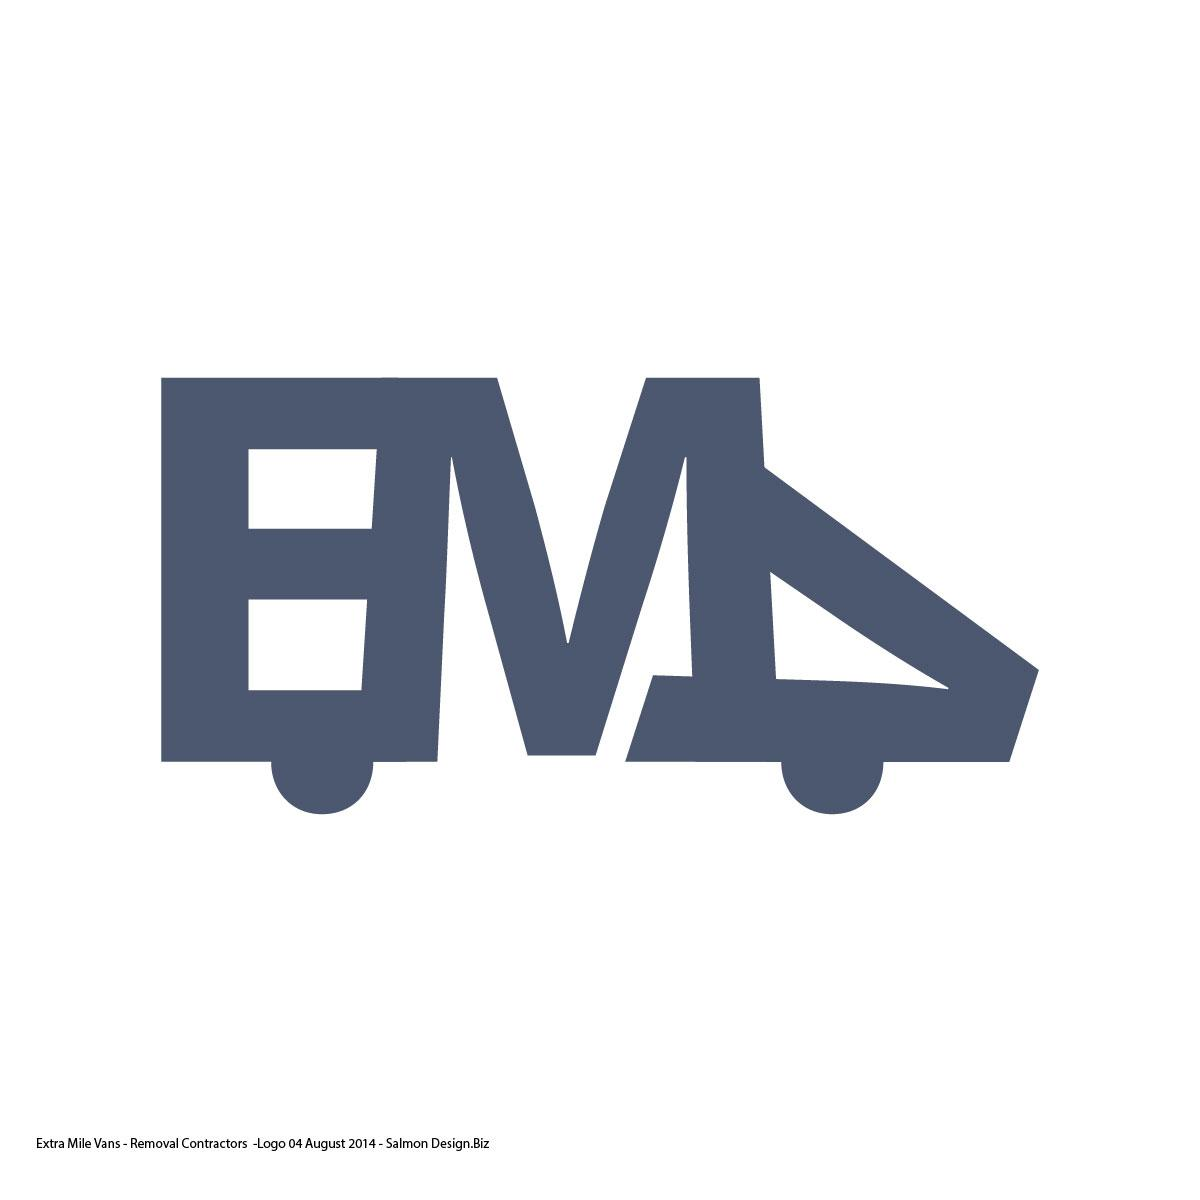 Extra Miles Vans Removal Contractors Ltd - London, London SE23 1EJ - 07951 535534 | ShowMeLocal.com